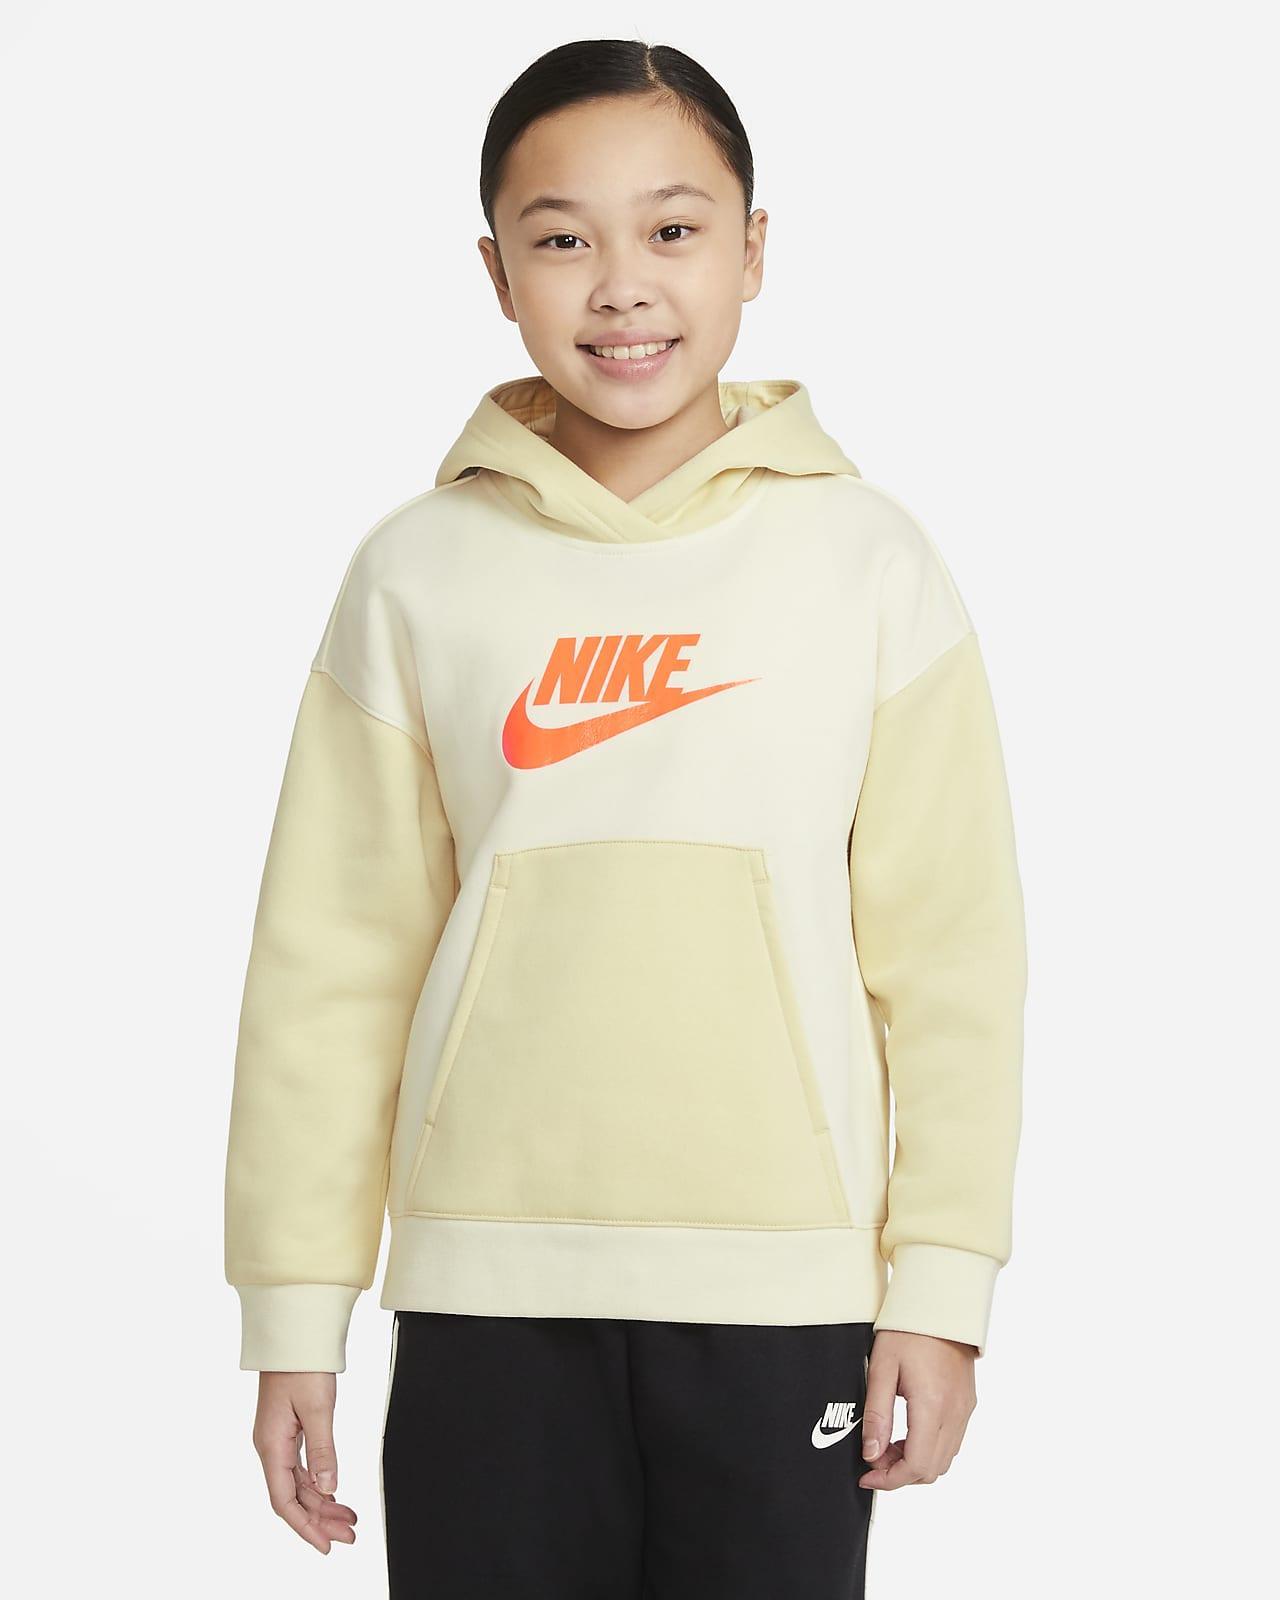 Nike Sportswear Genç Çocuk (Kız) Kapüşonlu Sweatshirt'ü